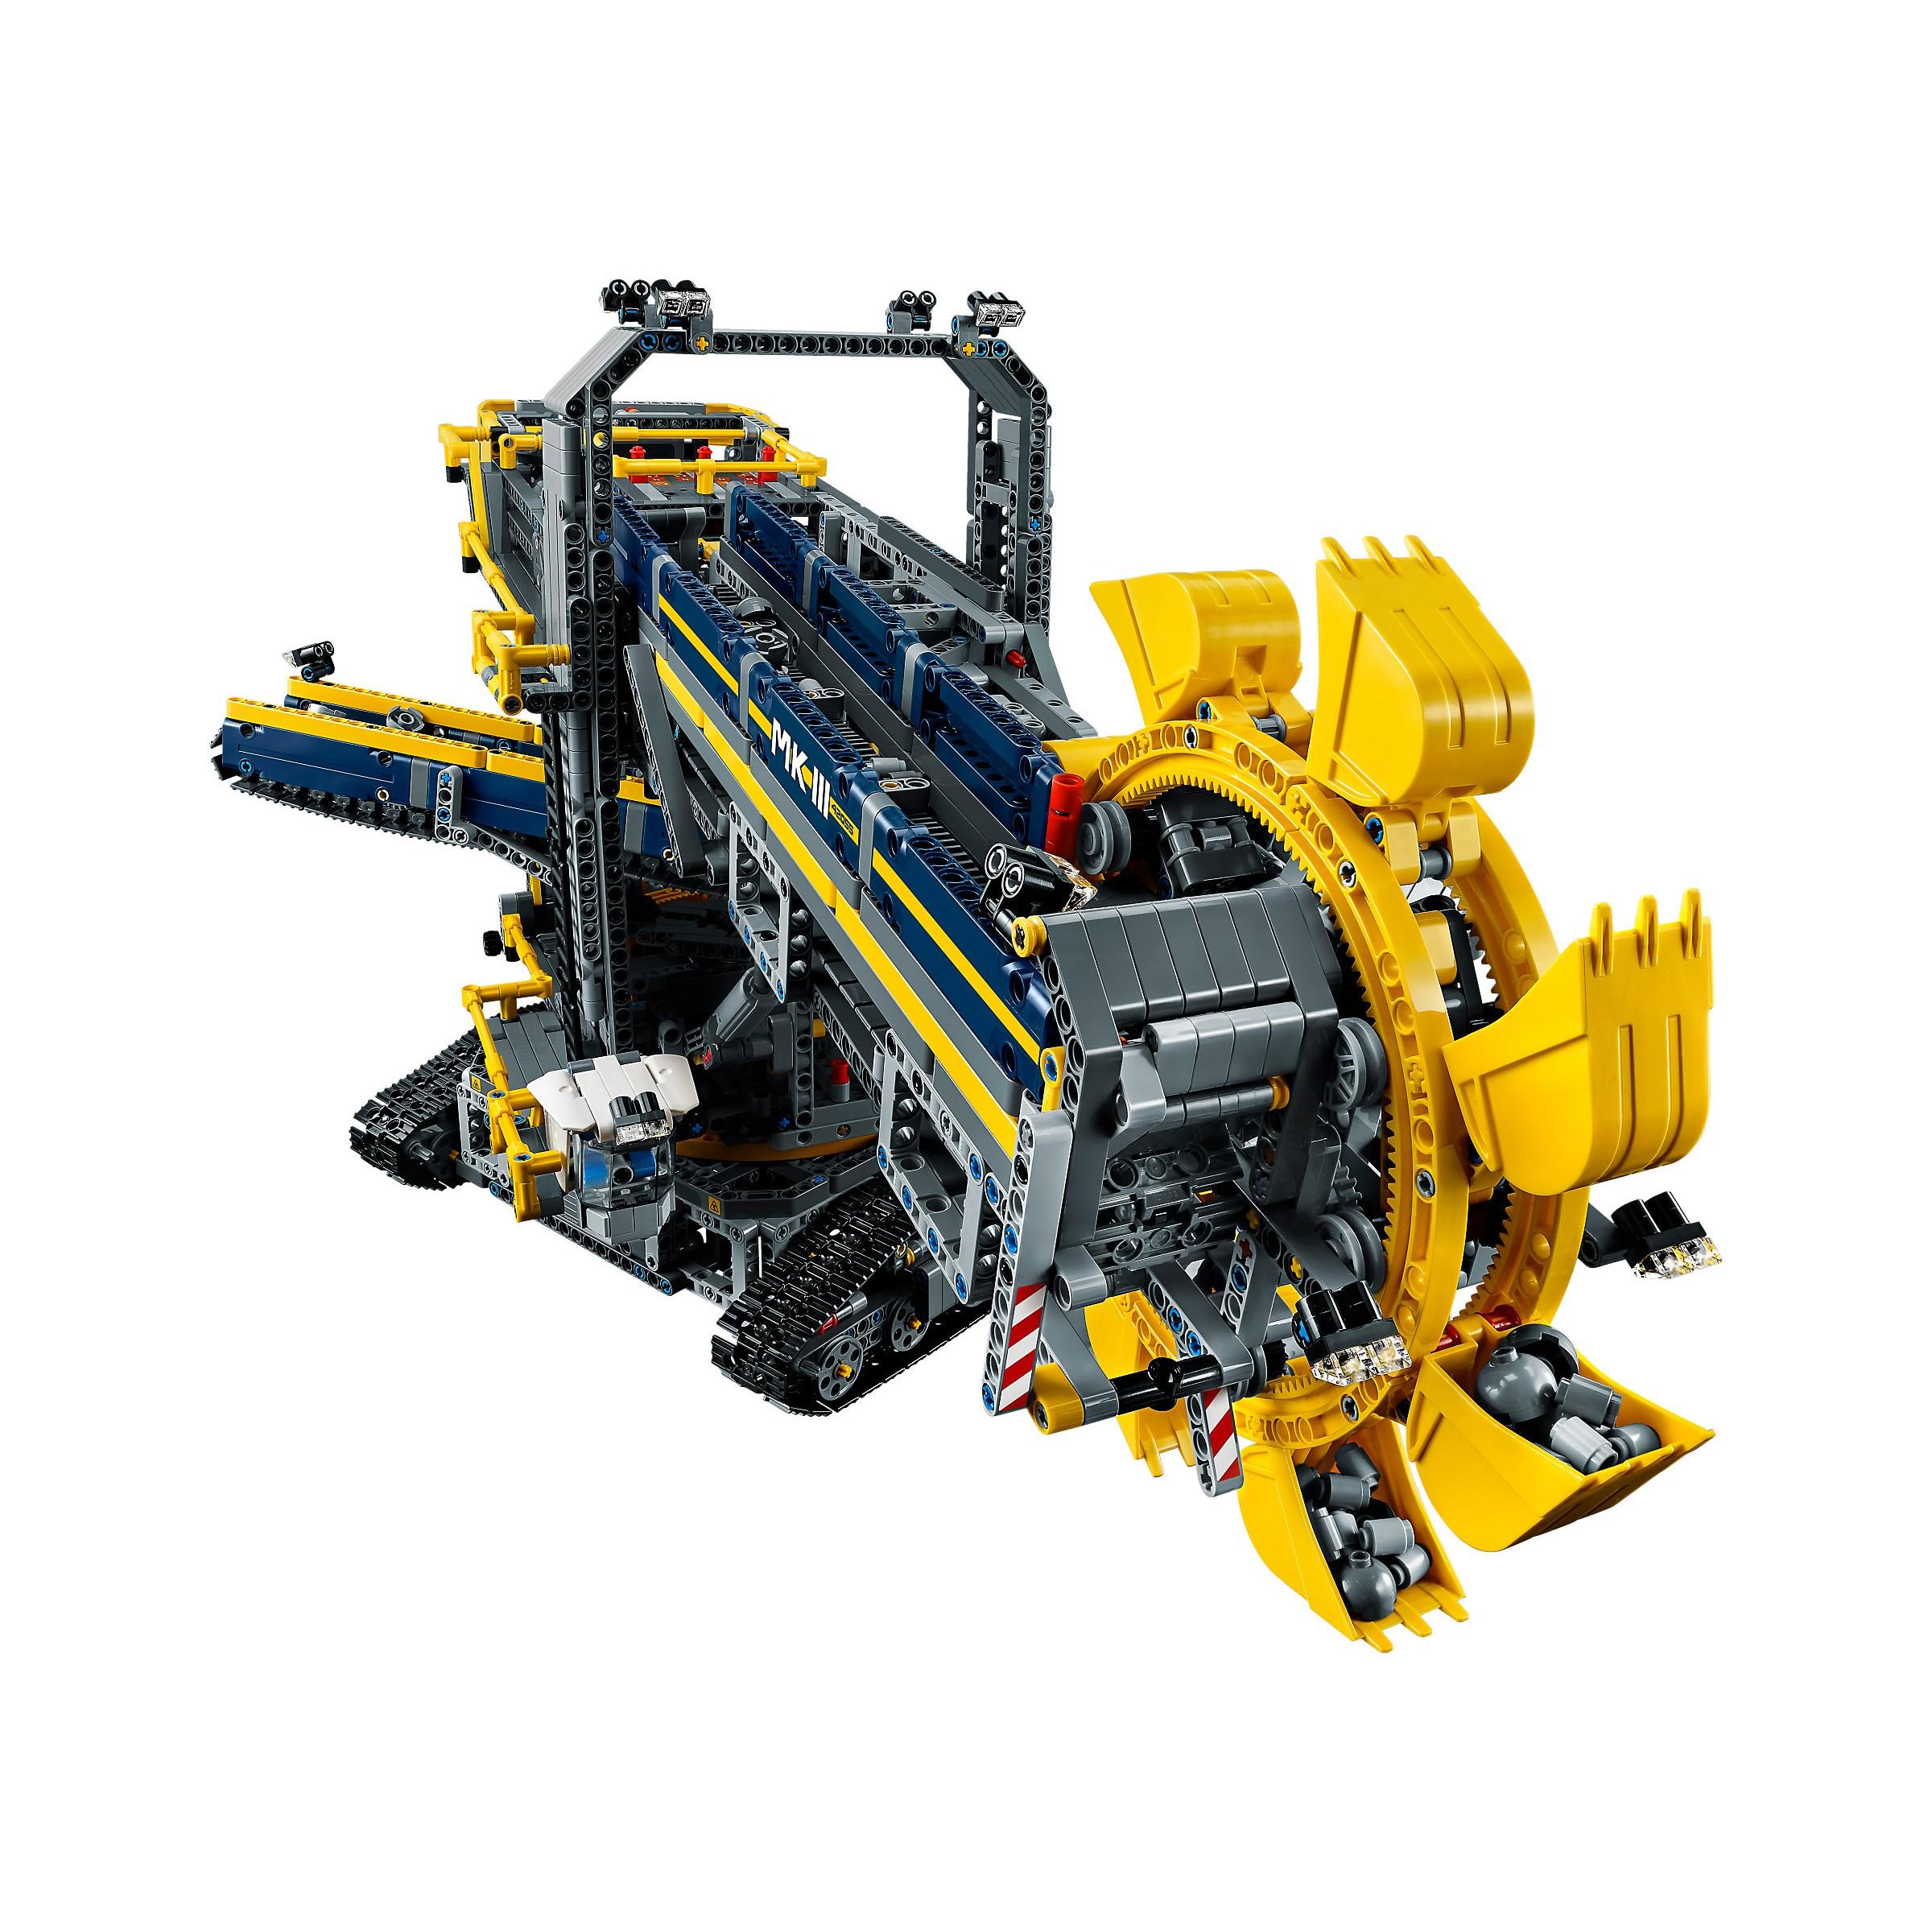 lego 42055 technic bucket wheel excavator at hobby warehouse. Black Bedroom Furniture Sets. Home Design Ideas